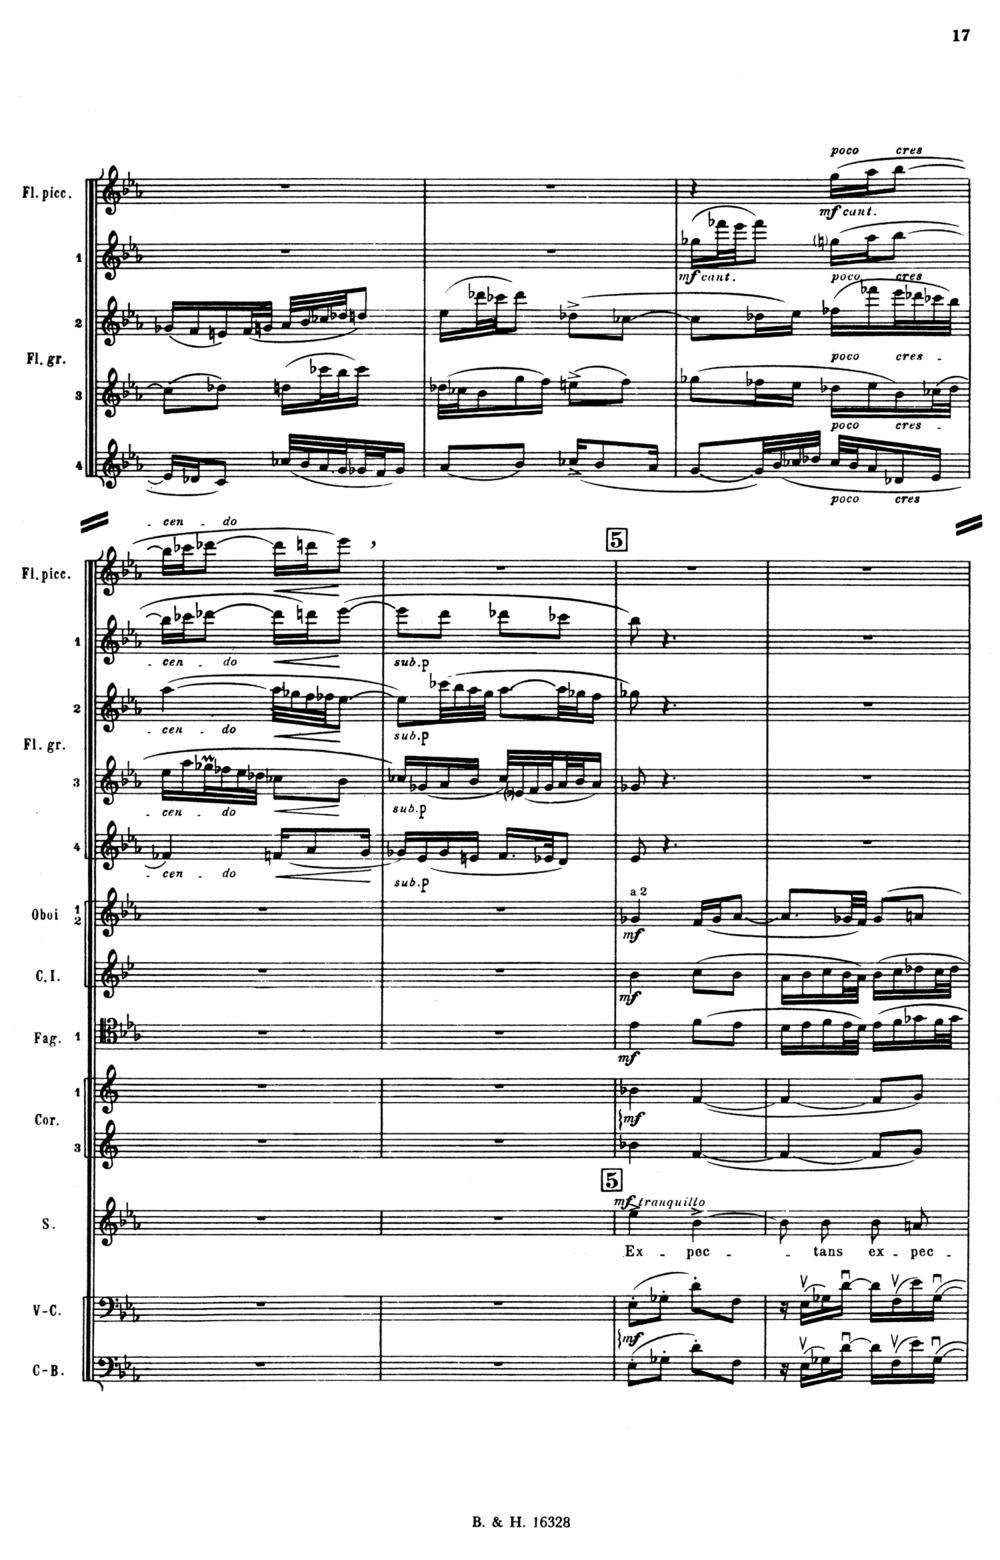 Stravinsky Psalms Score 4.jpg